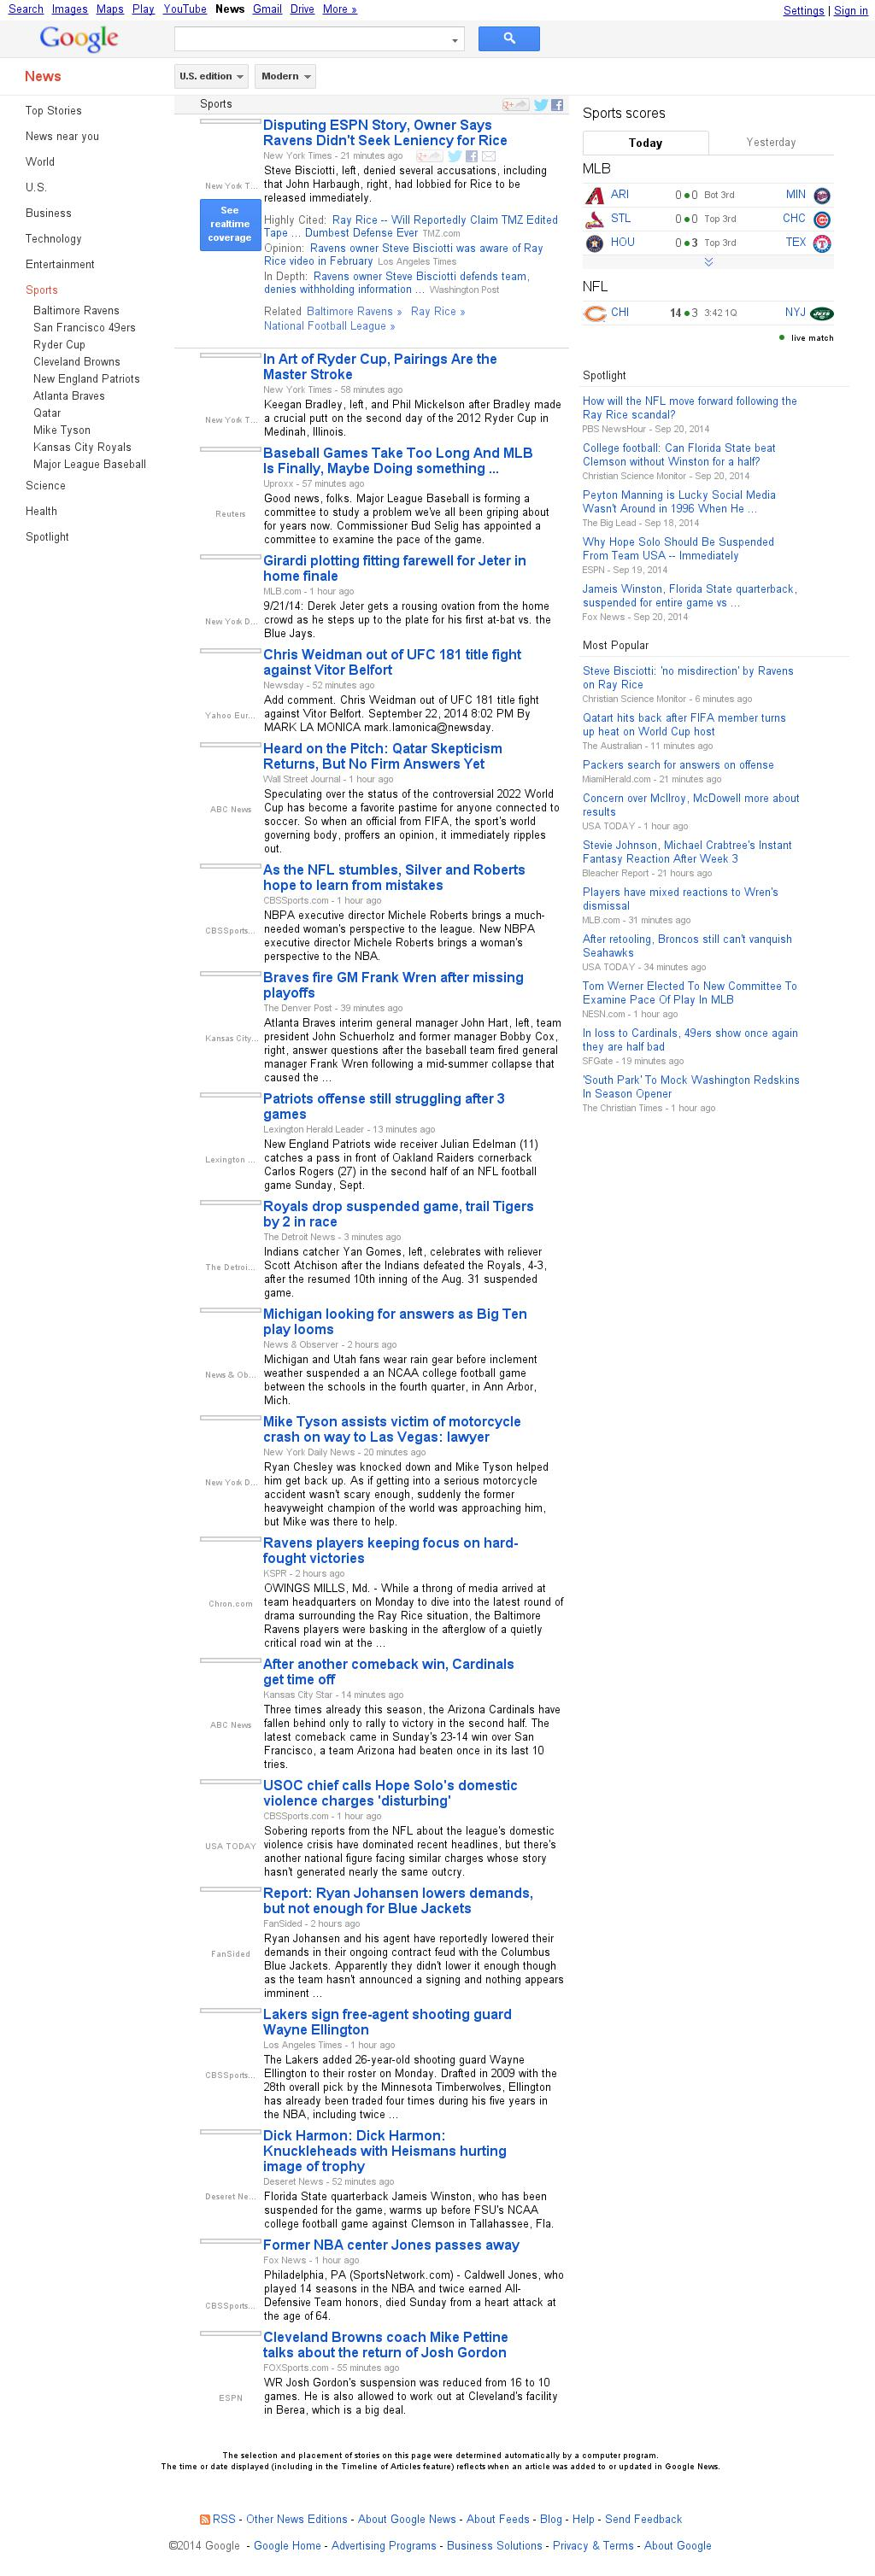 Google News: Sports at Tuesday Sept. 23, 2014, 1:08 a.m. UTC